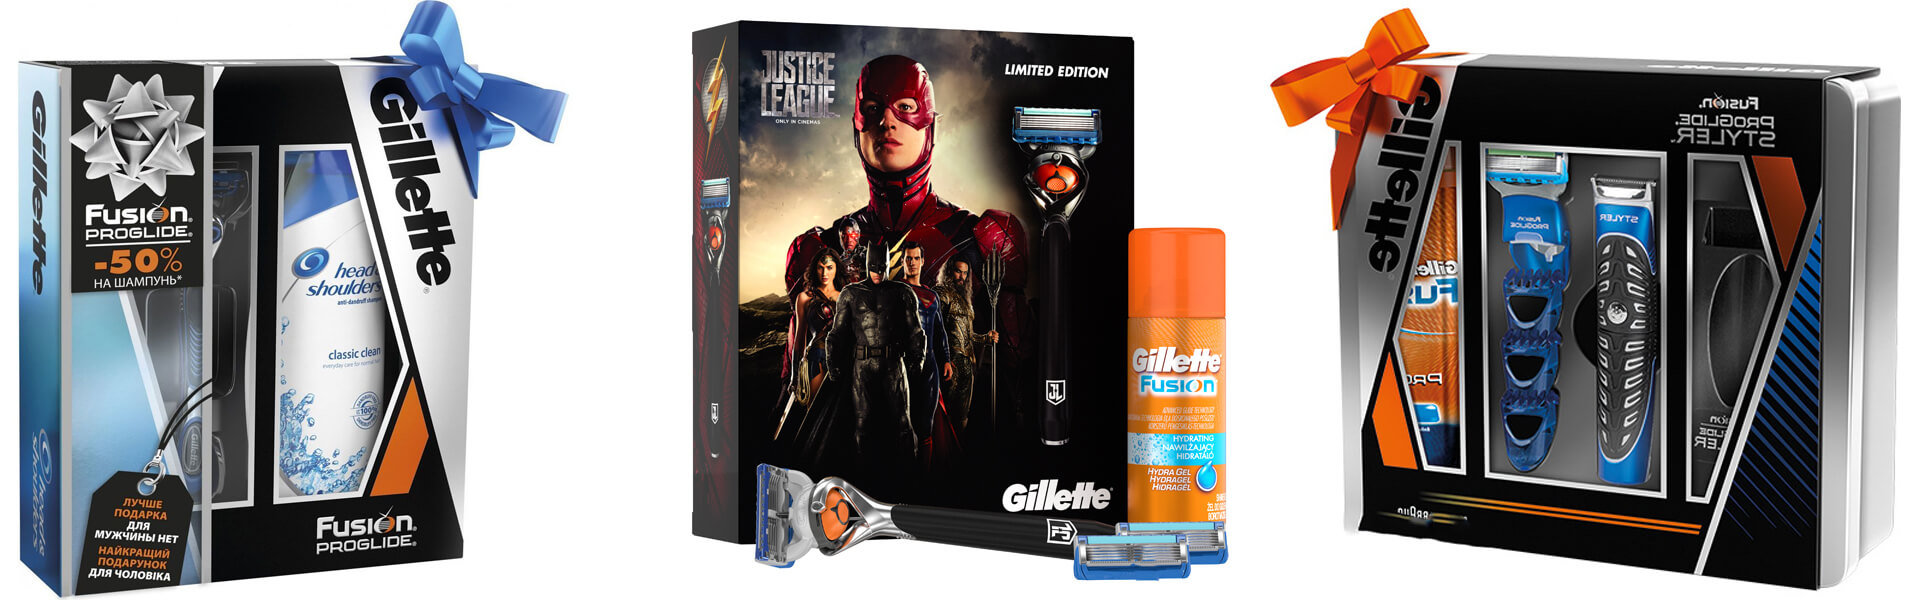 Фото - Подарочная коробка для средств для бритья Полиграф-Сити